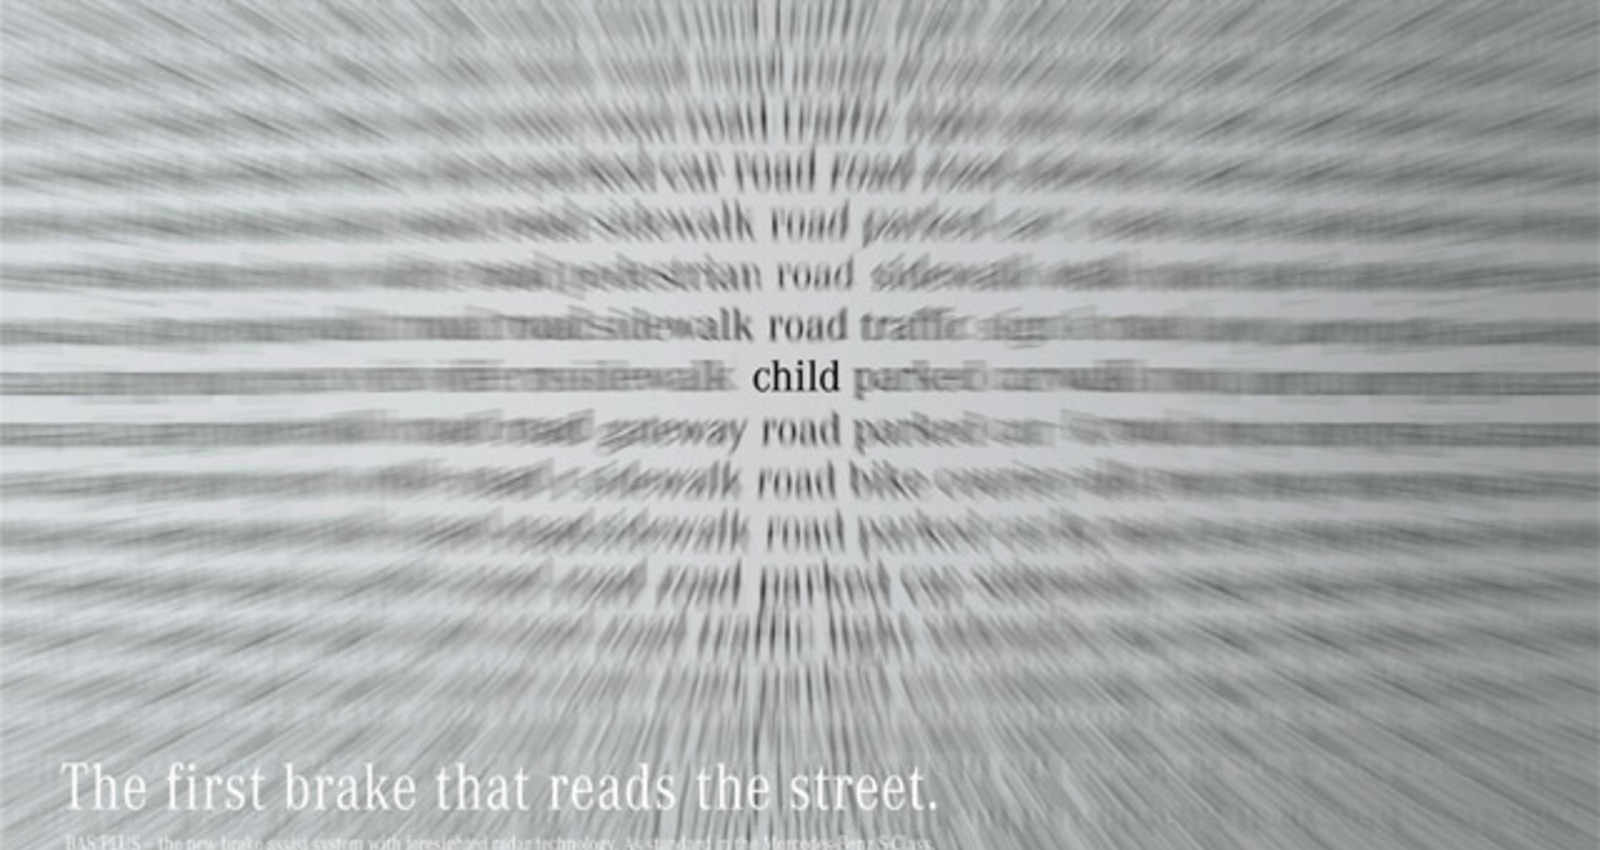 Read the street